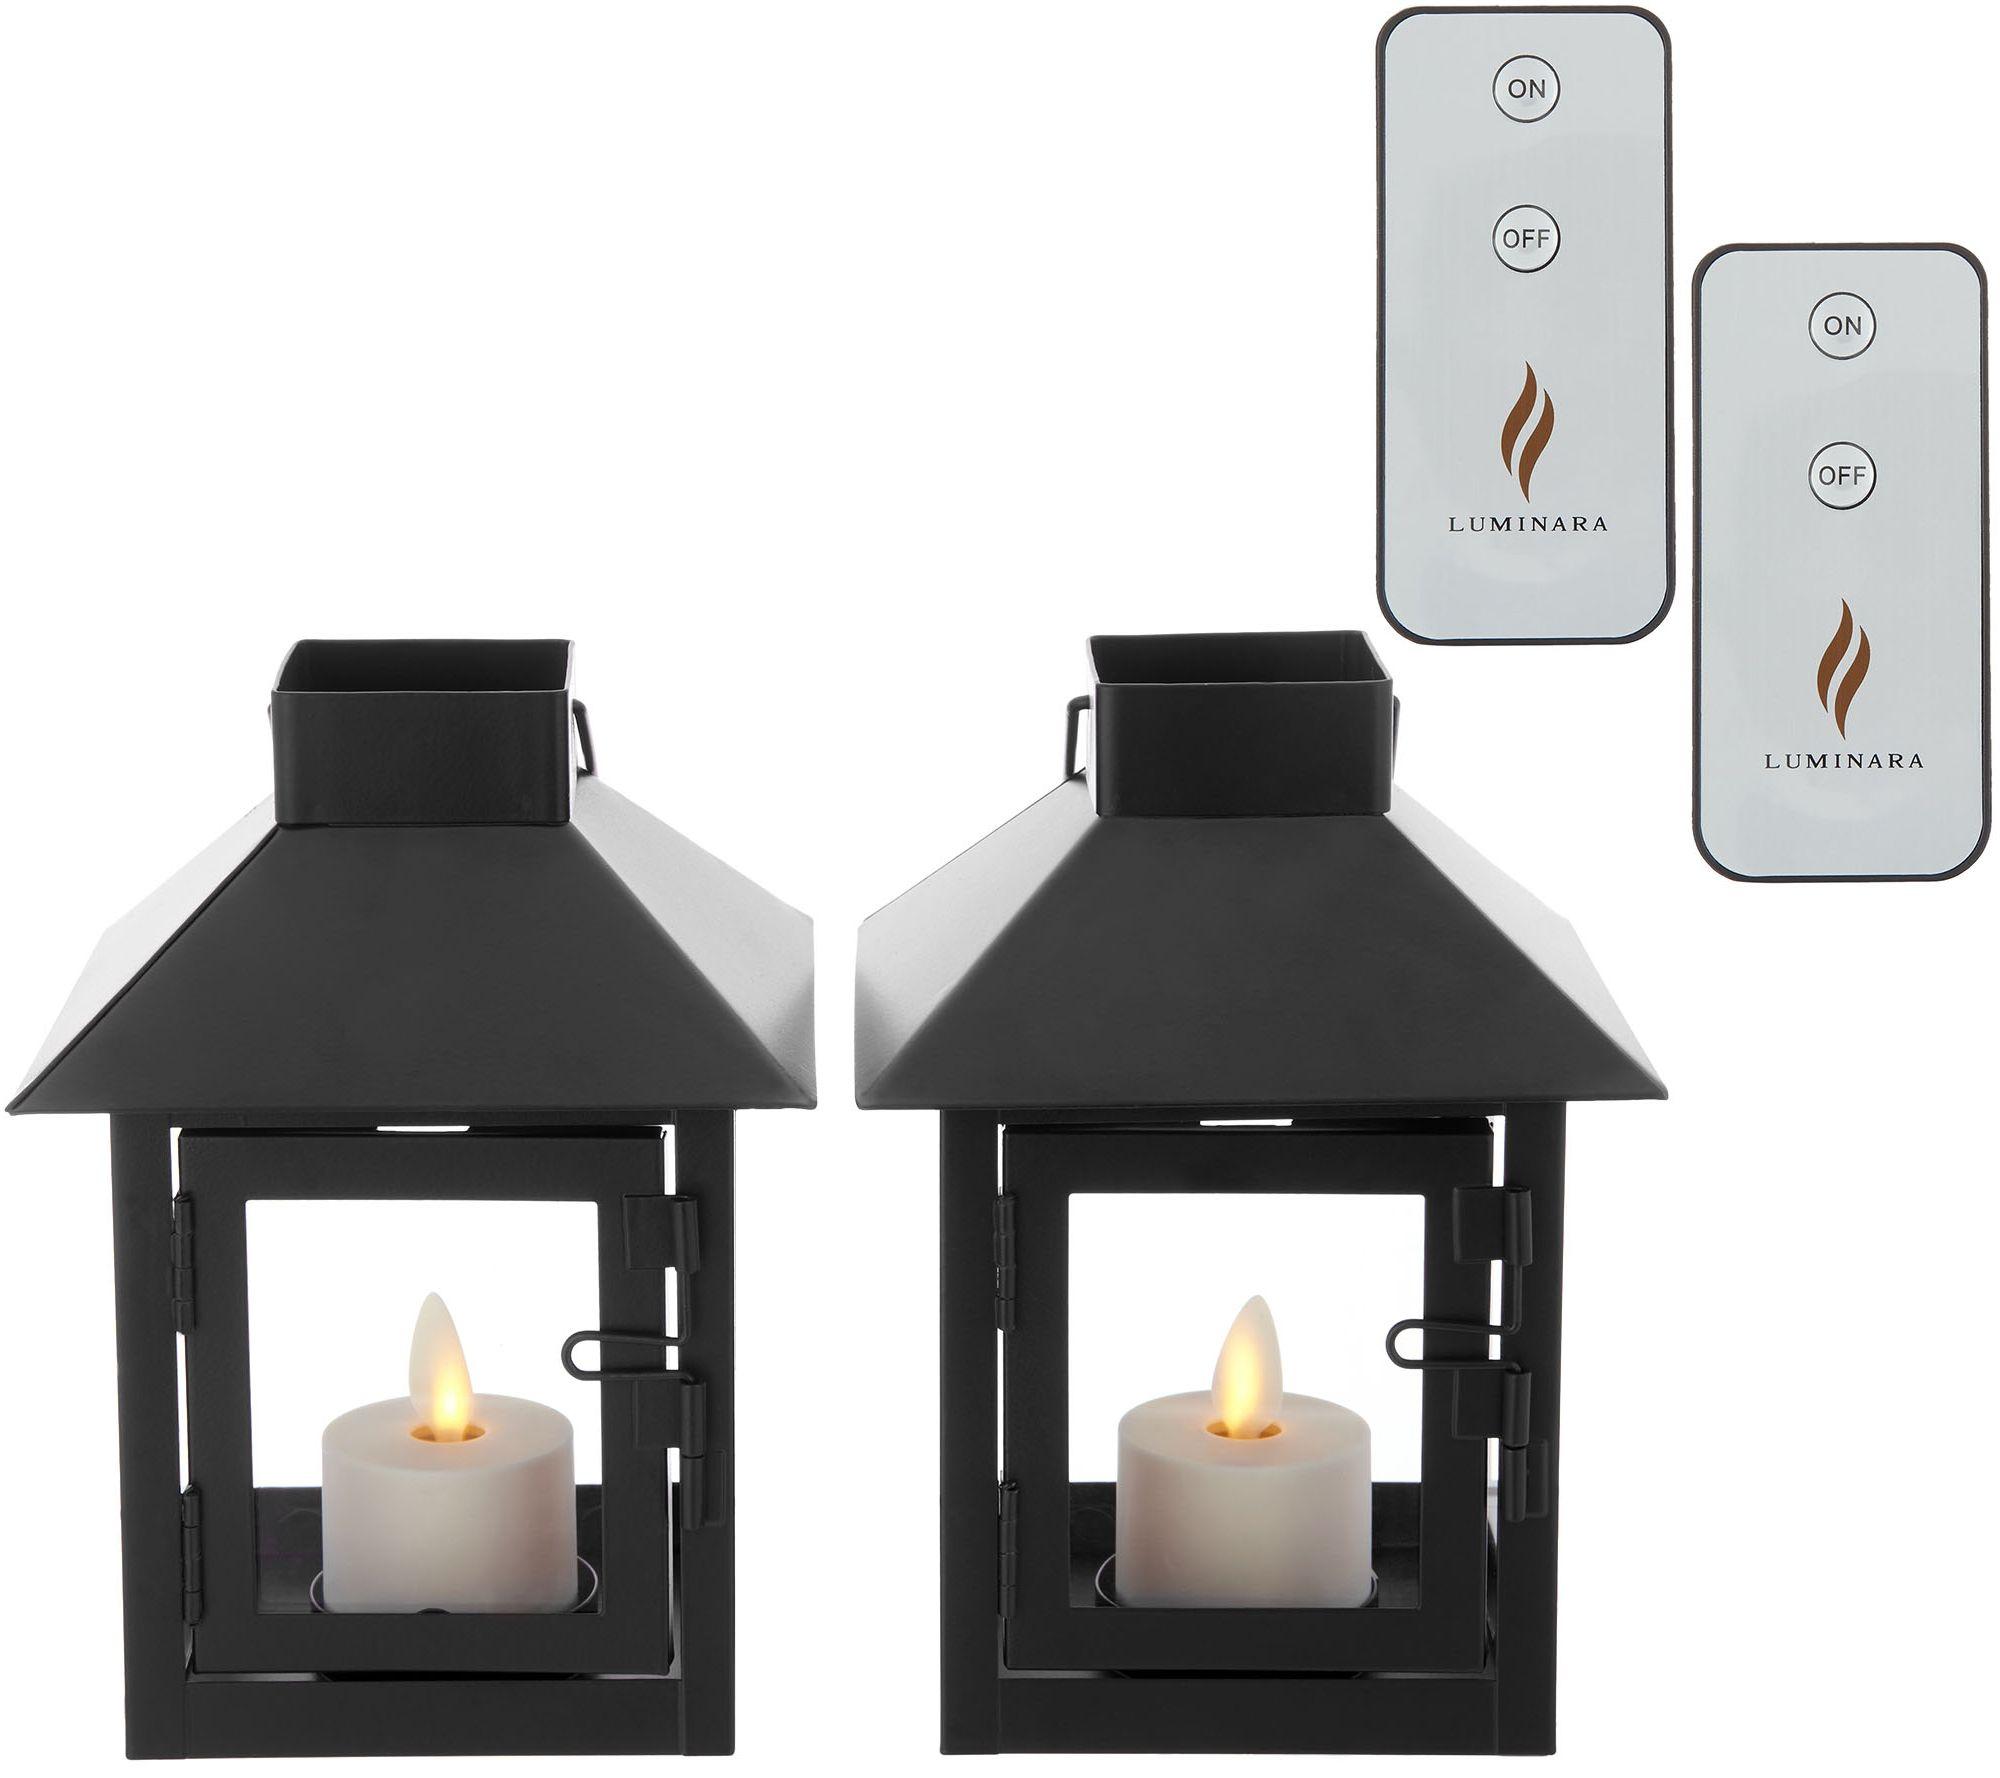 cf22fec6c0 Luminara Set of 2 Mini Lanterns with Tea Lights & (2) Remotes - Page 1 —  QVC.com